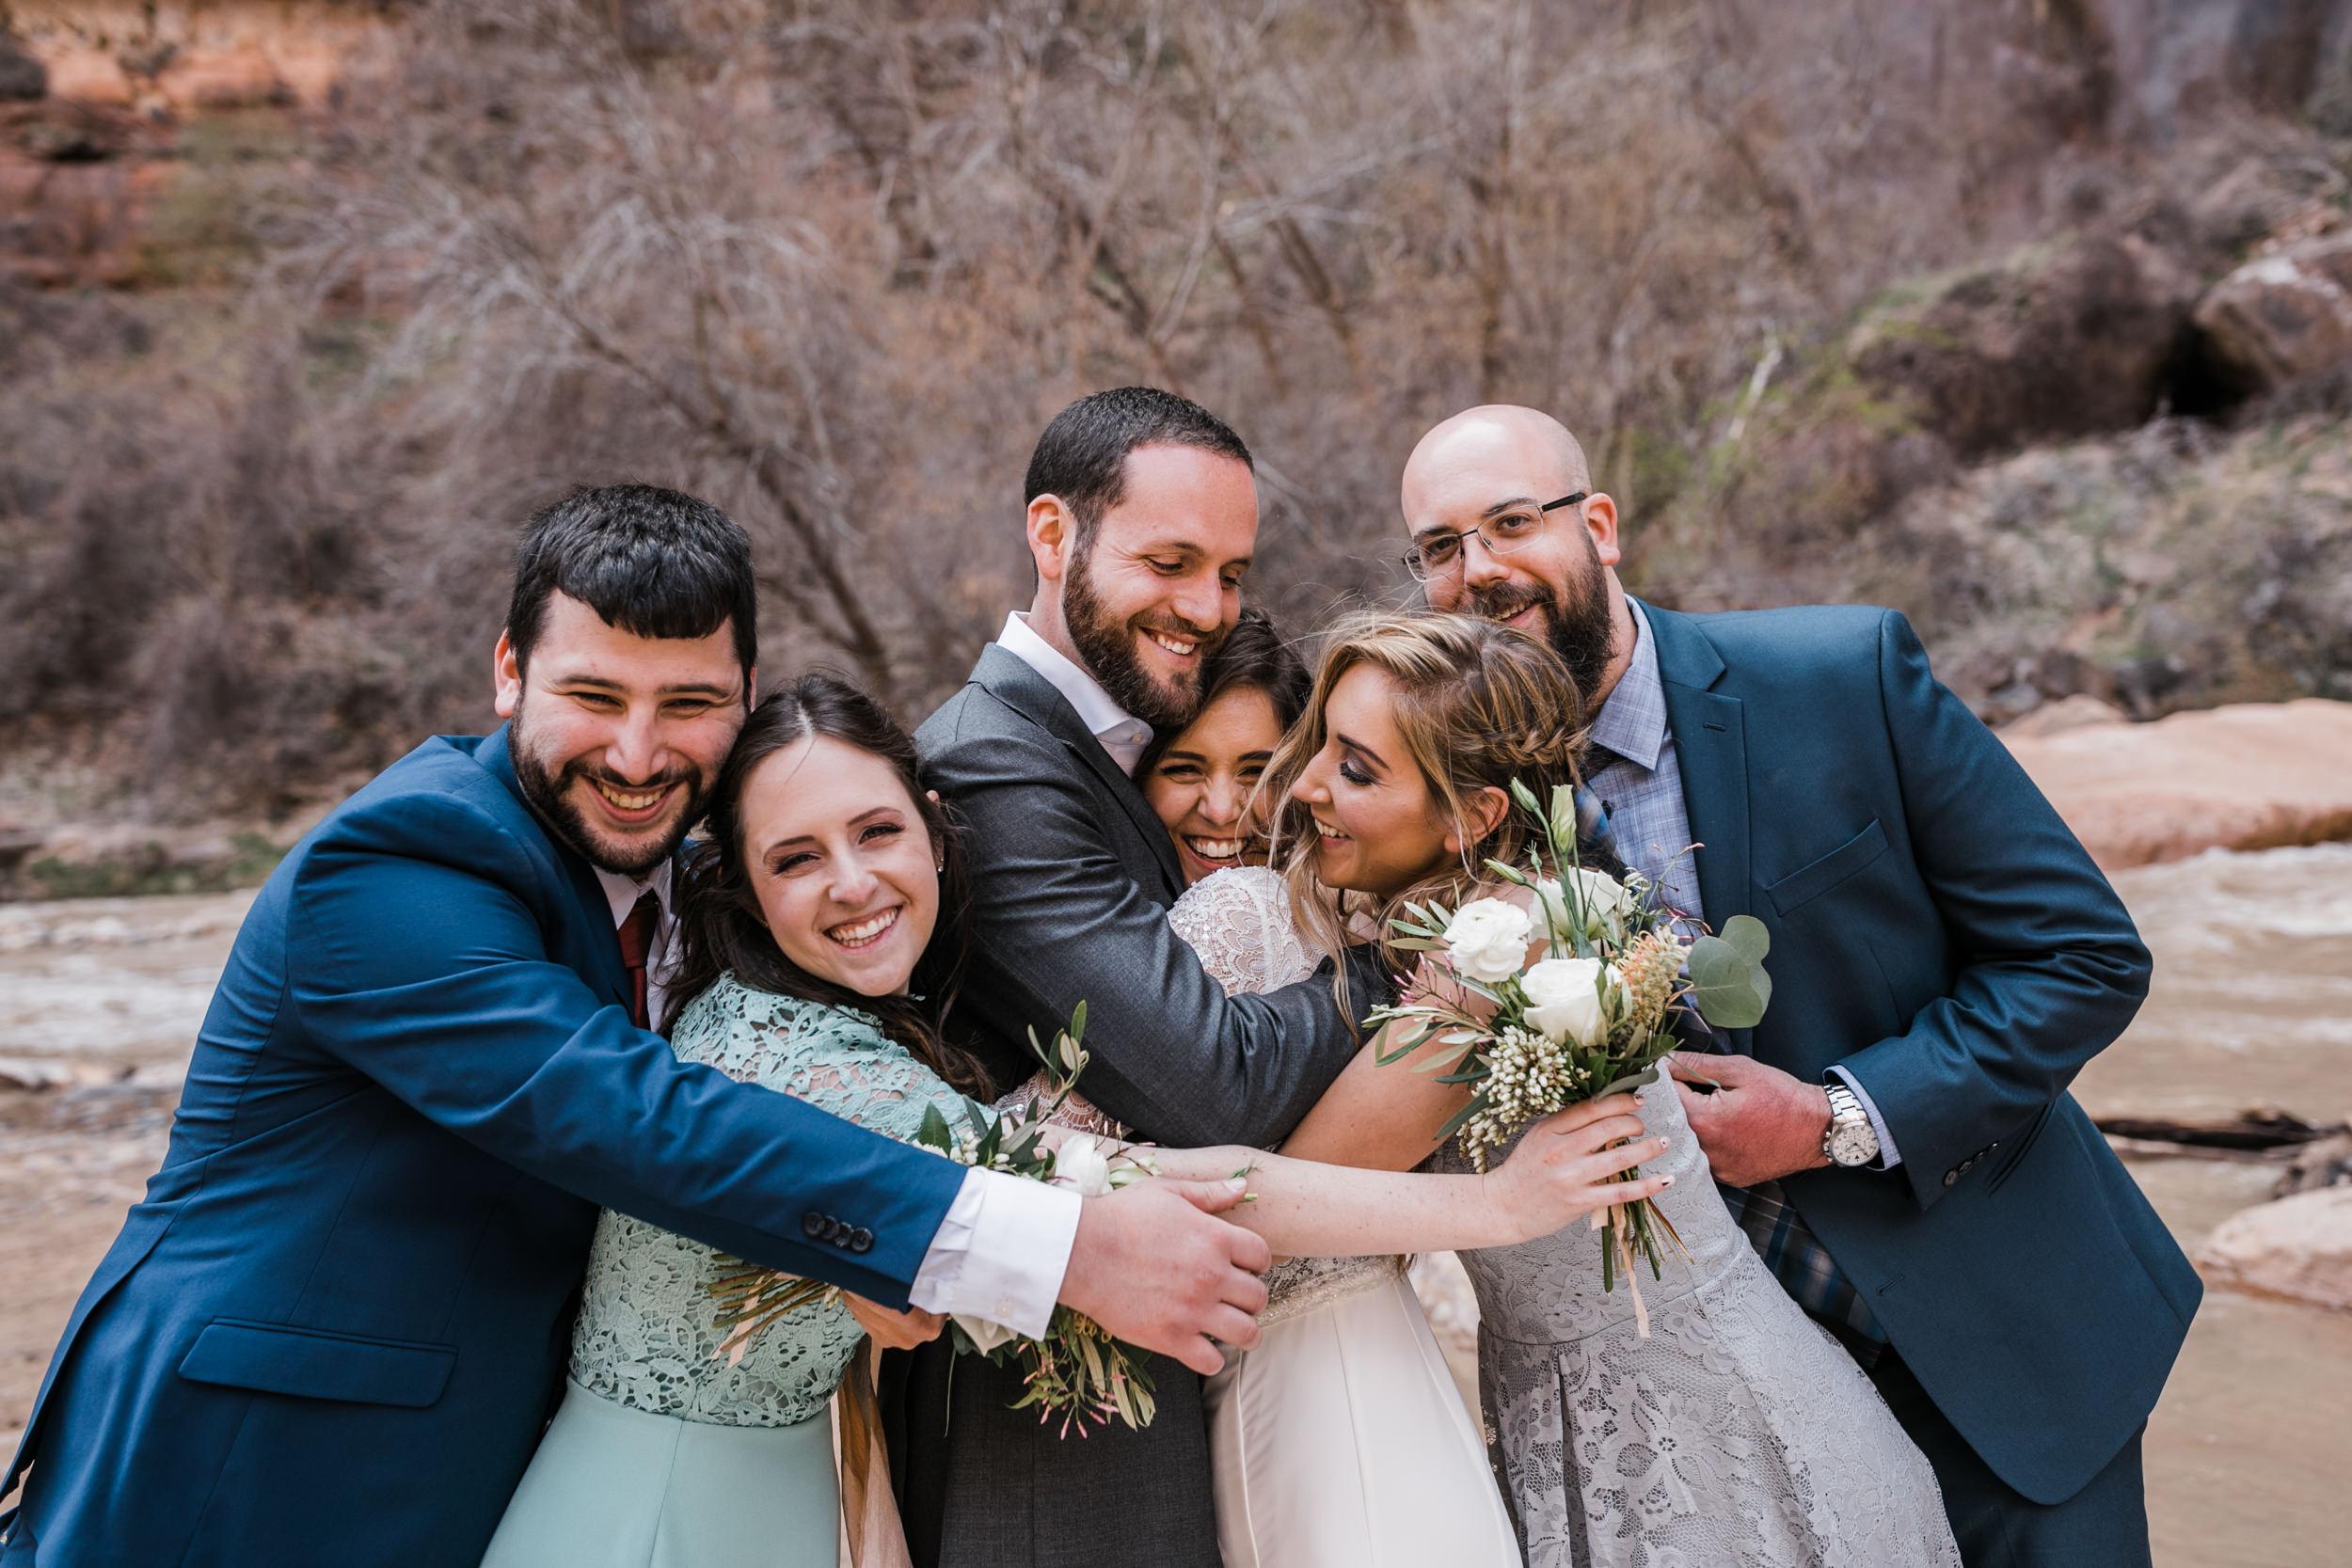 Zion-National-Park-Adventure-Wedding-Hearnes-Elopement-Photography-16.jpg